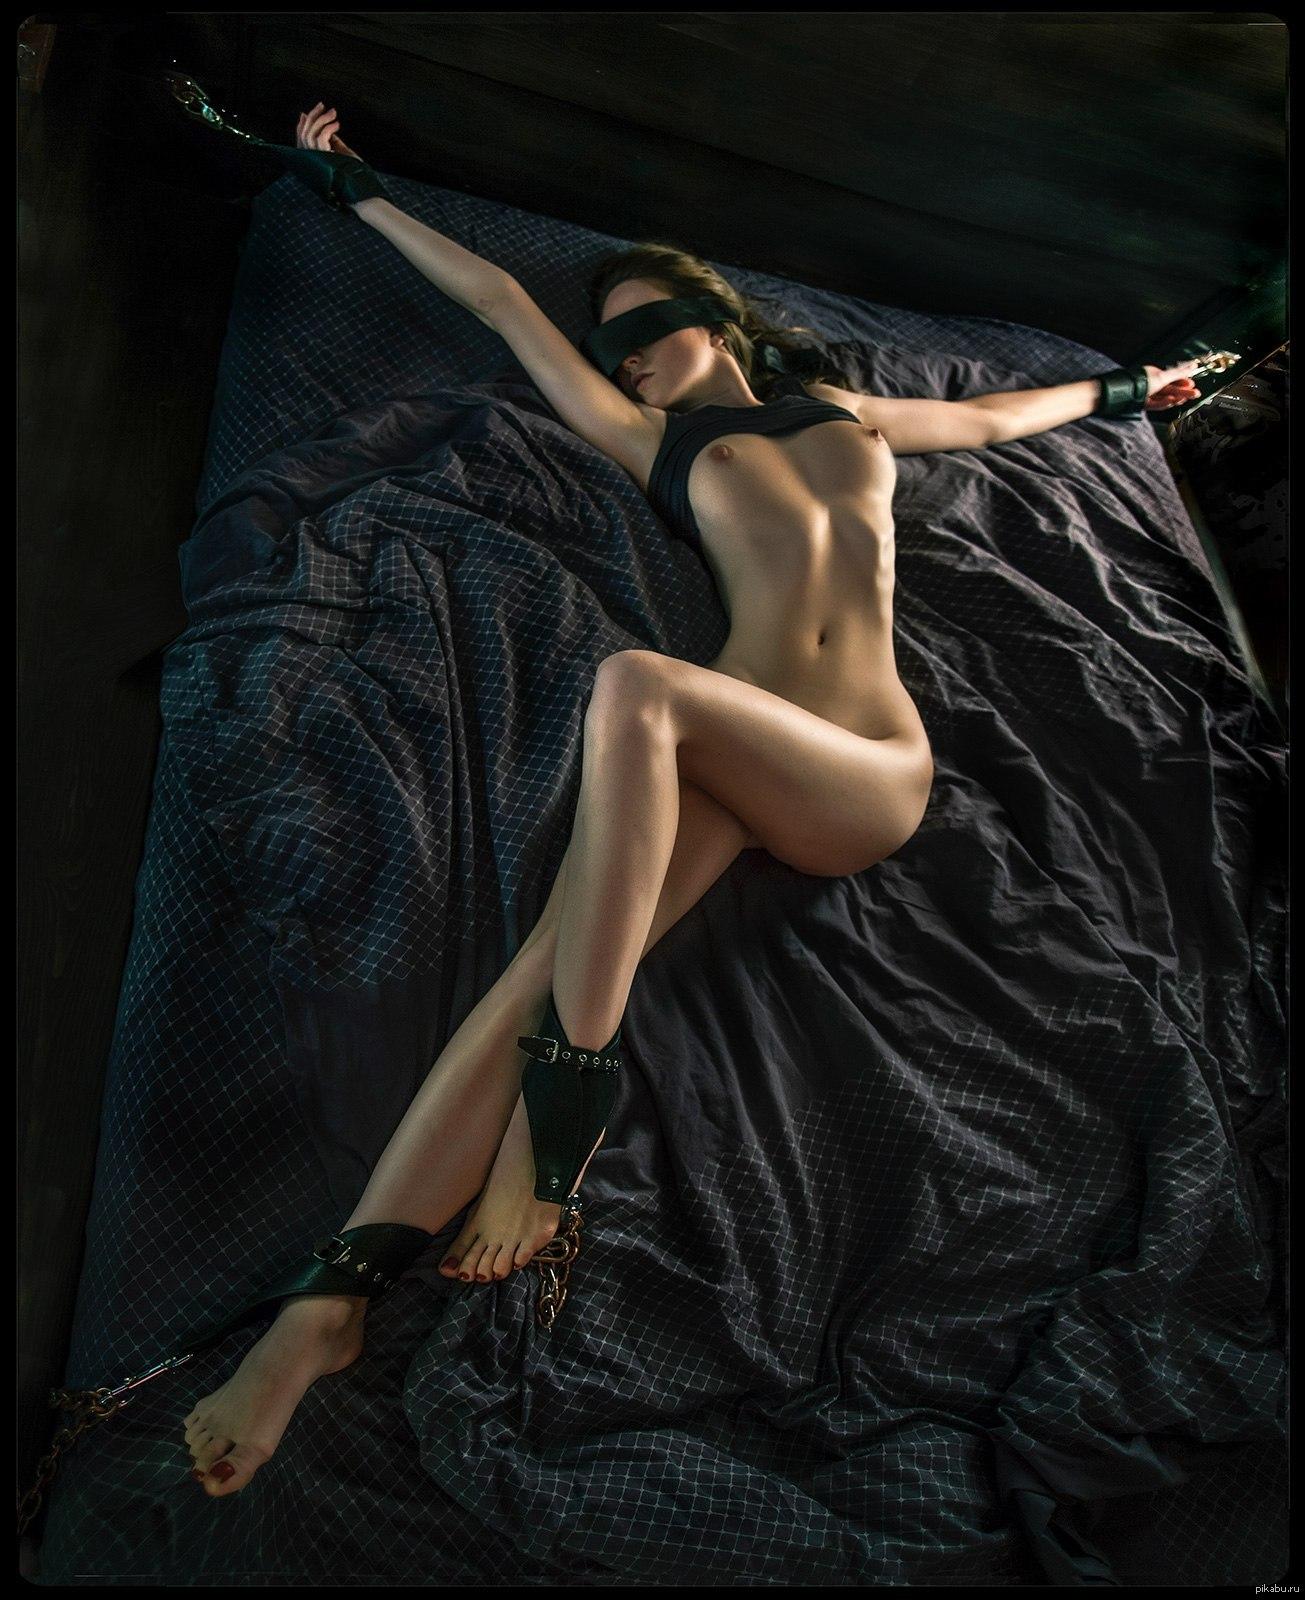 Эротика фантазии фото 7 фотография